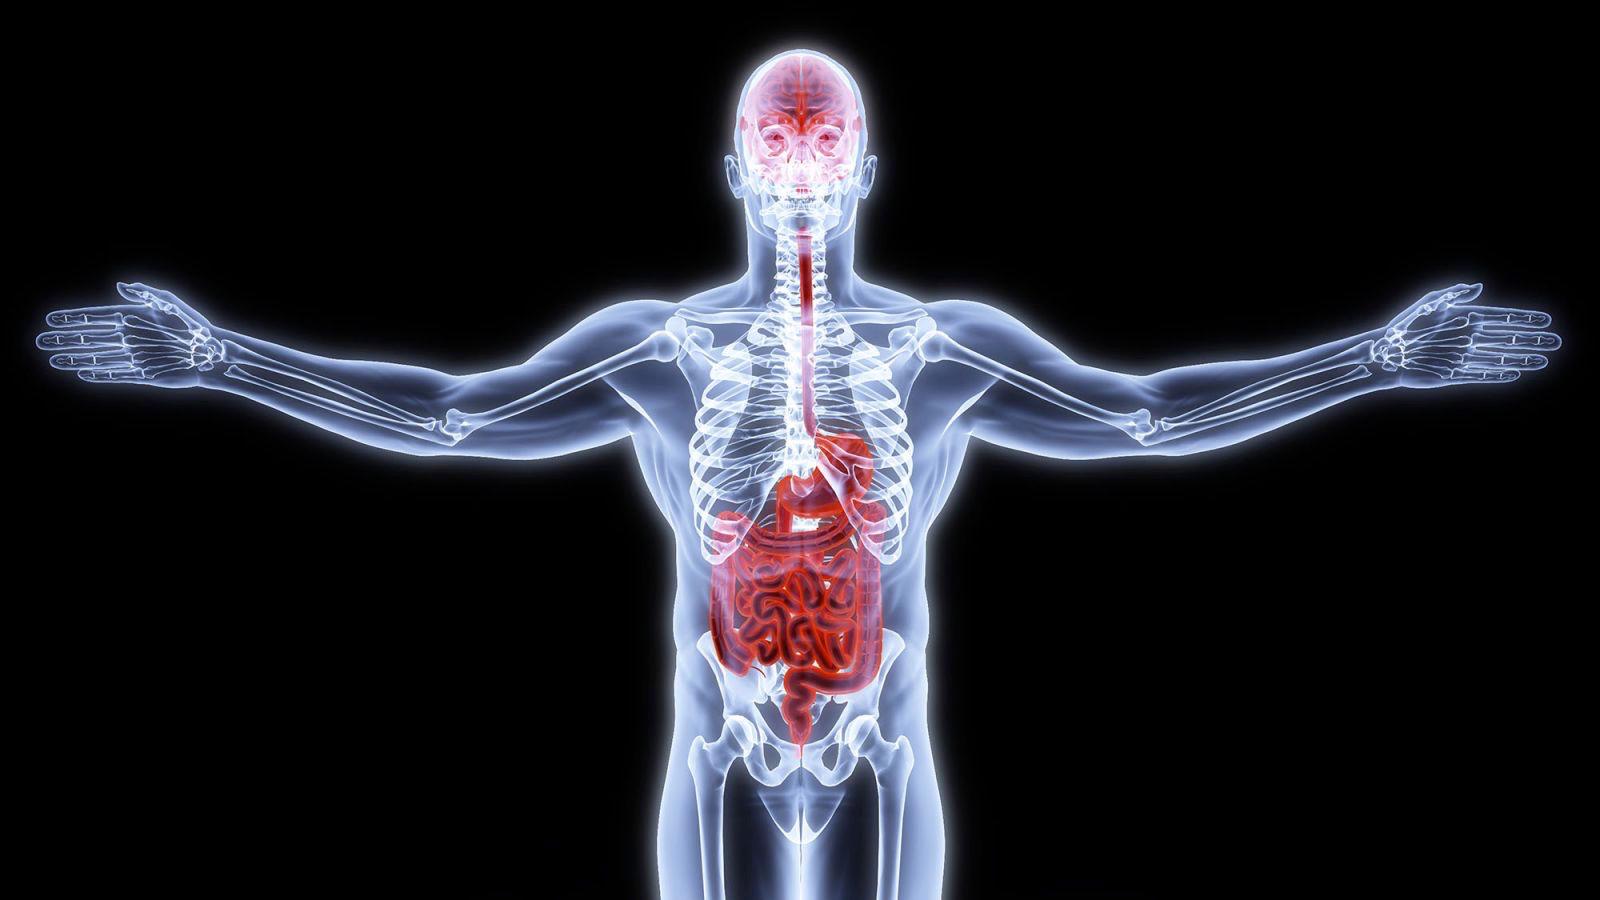 gut health image